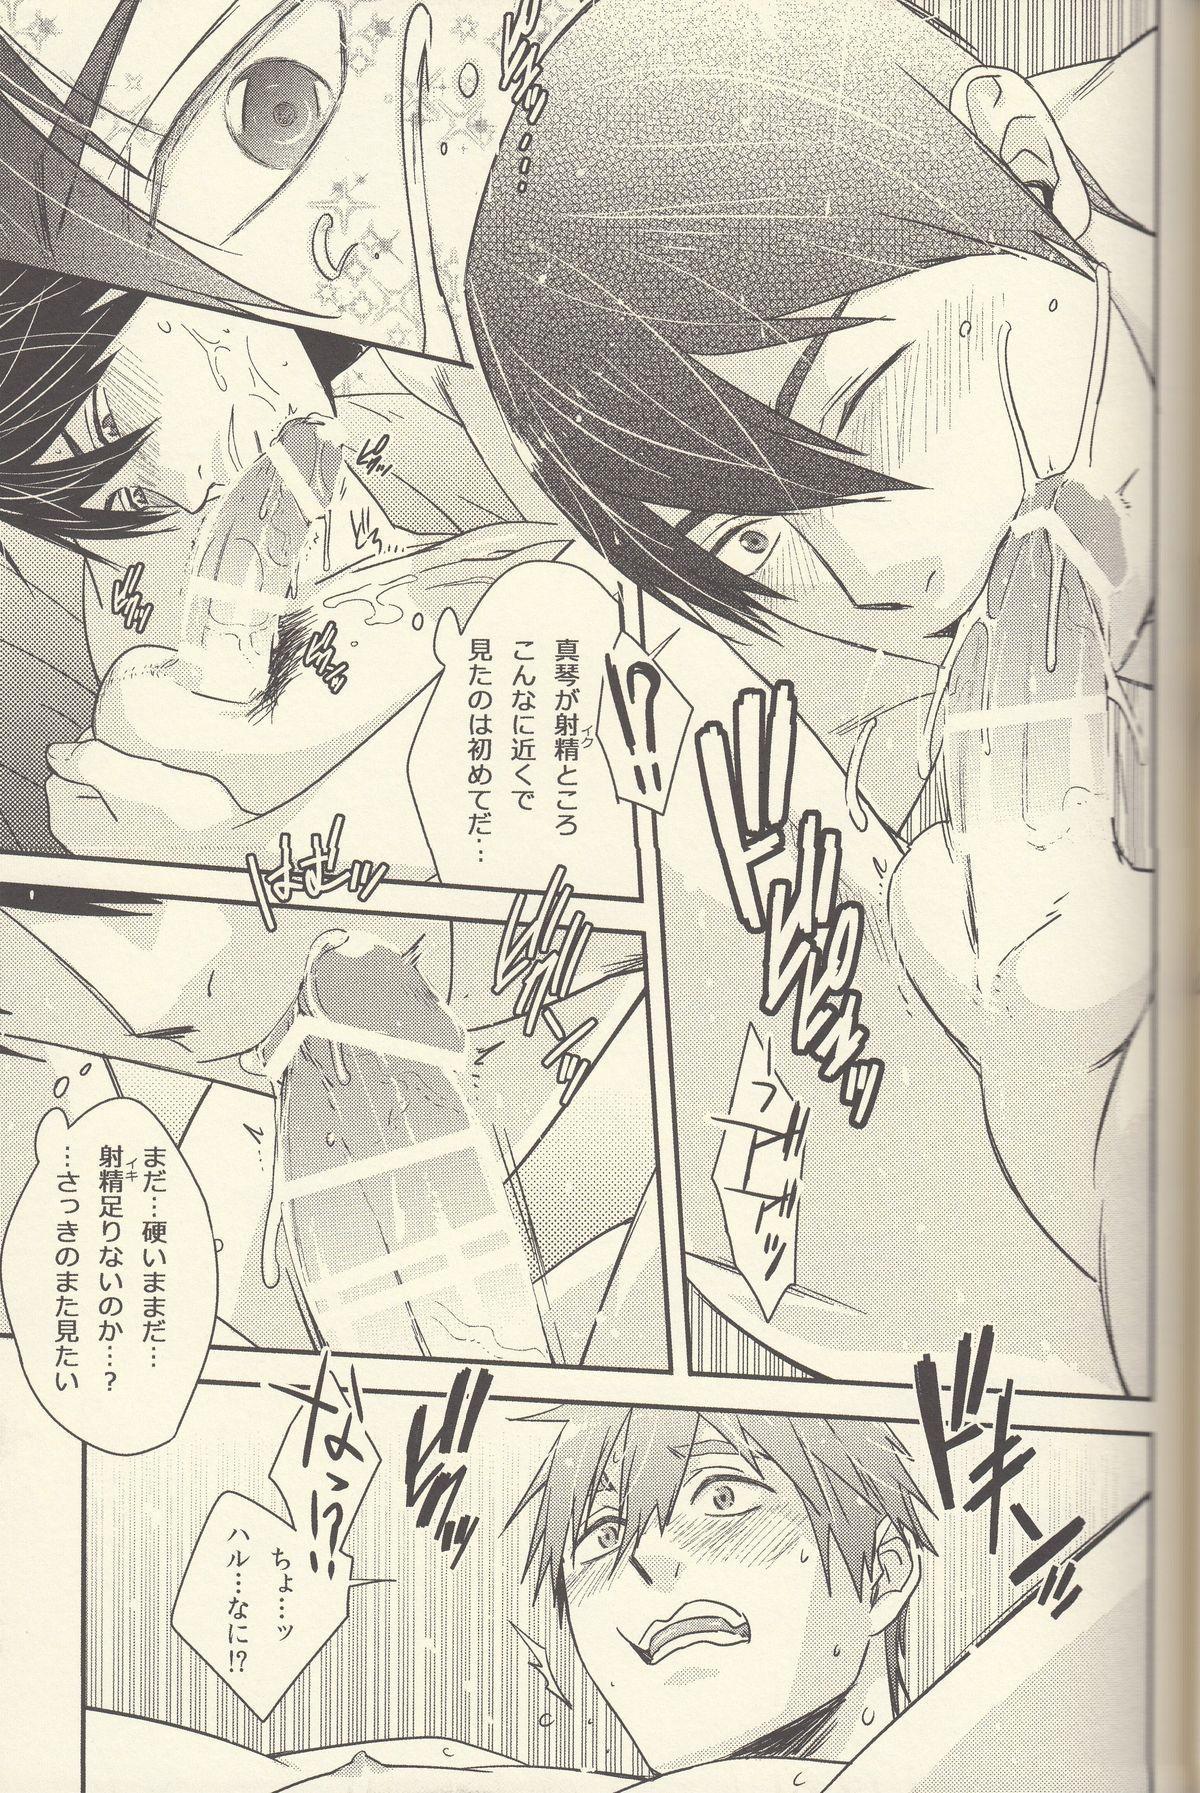 Shiofuki no Friendship - Makoto ♥ Haruka Squirting Anthology 36